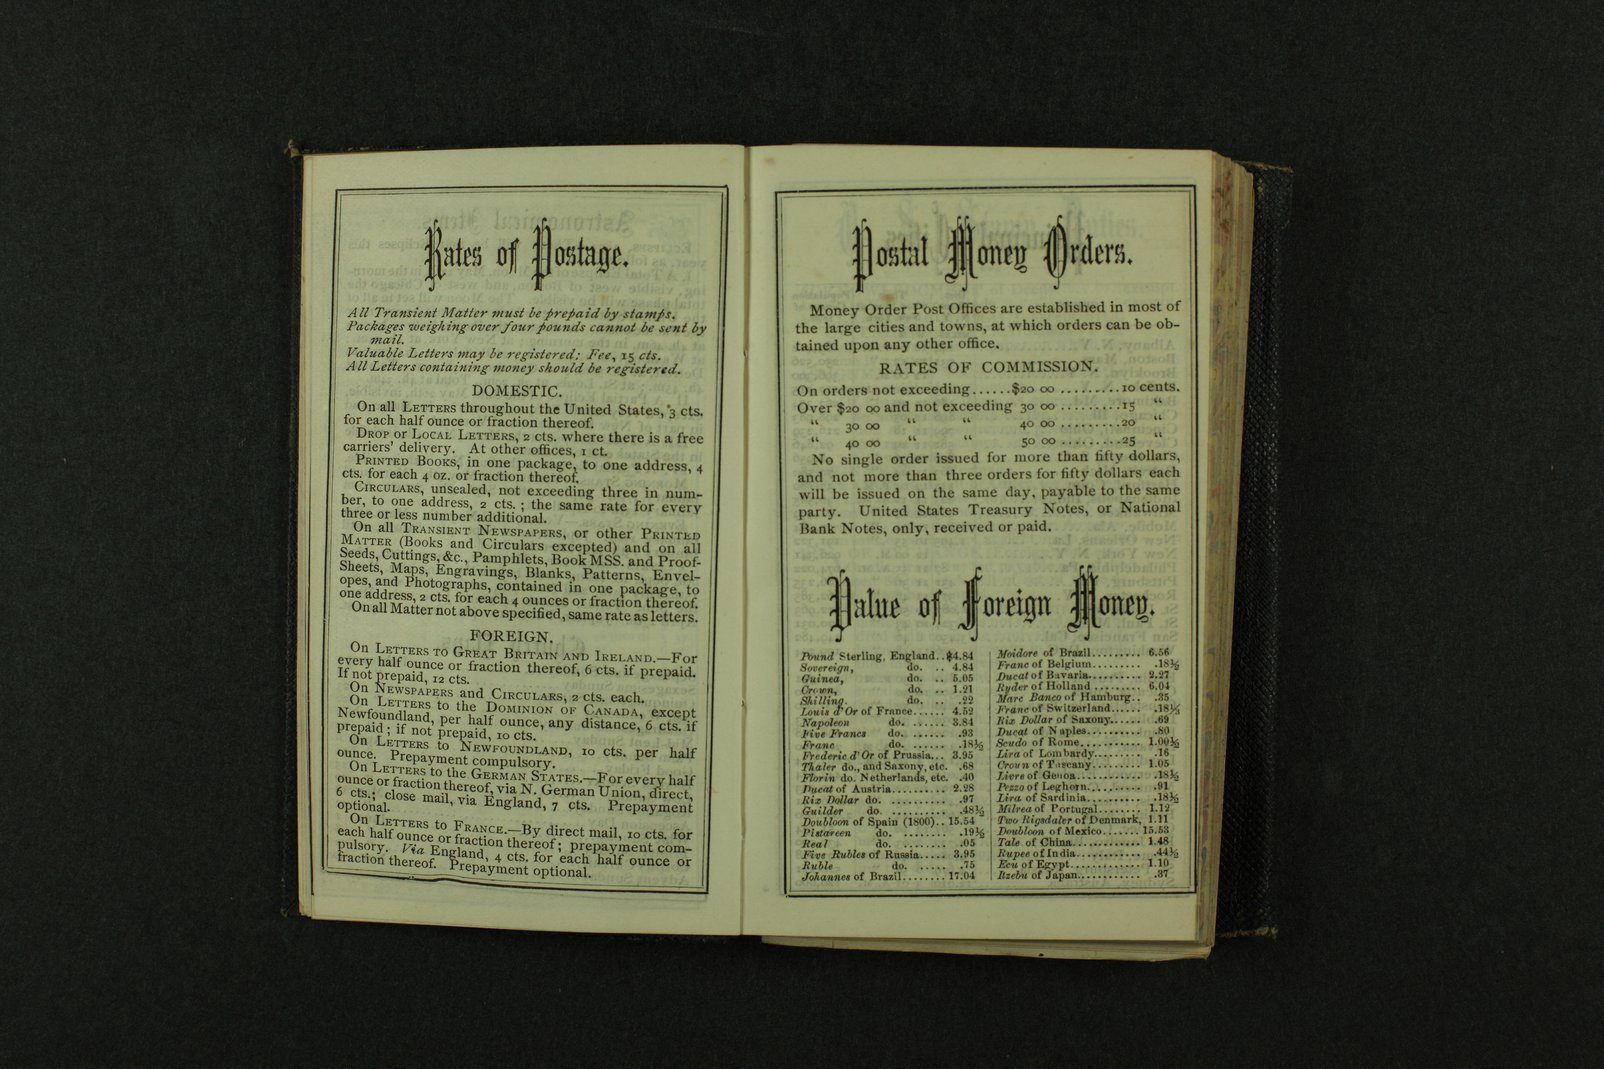 William E. Goodnow diary - 12